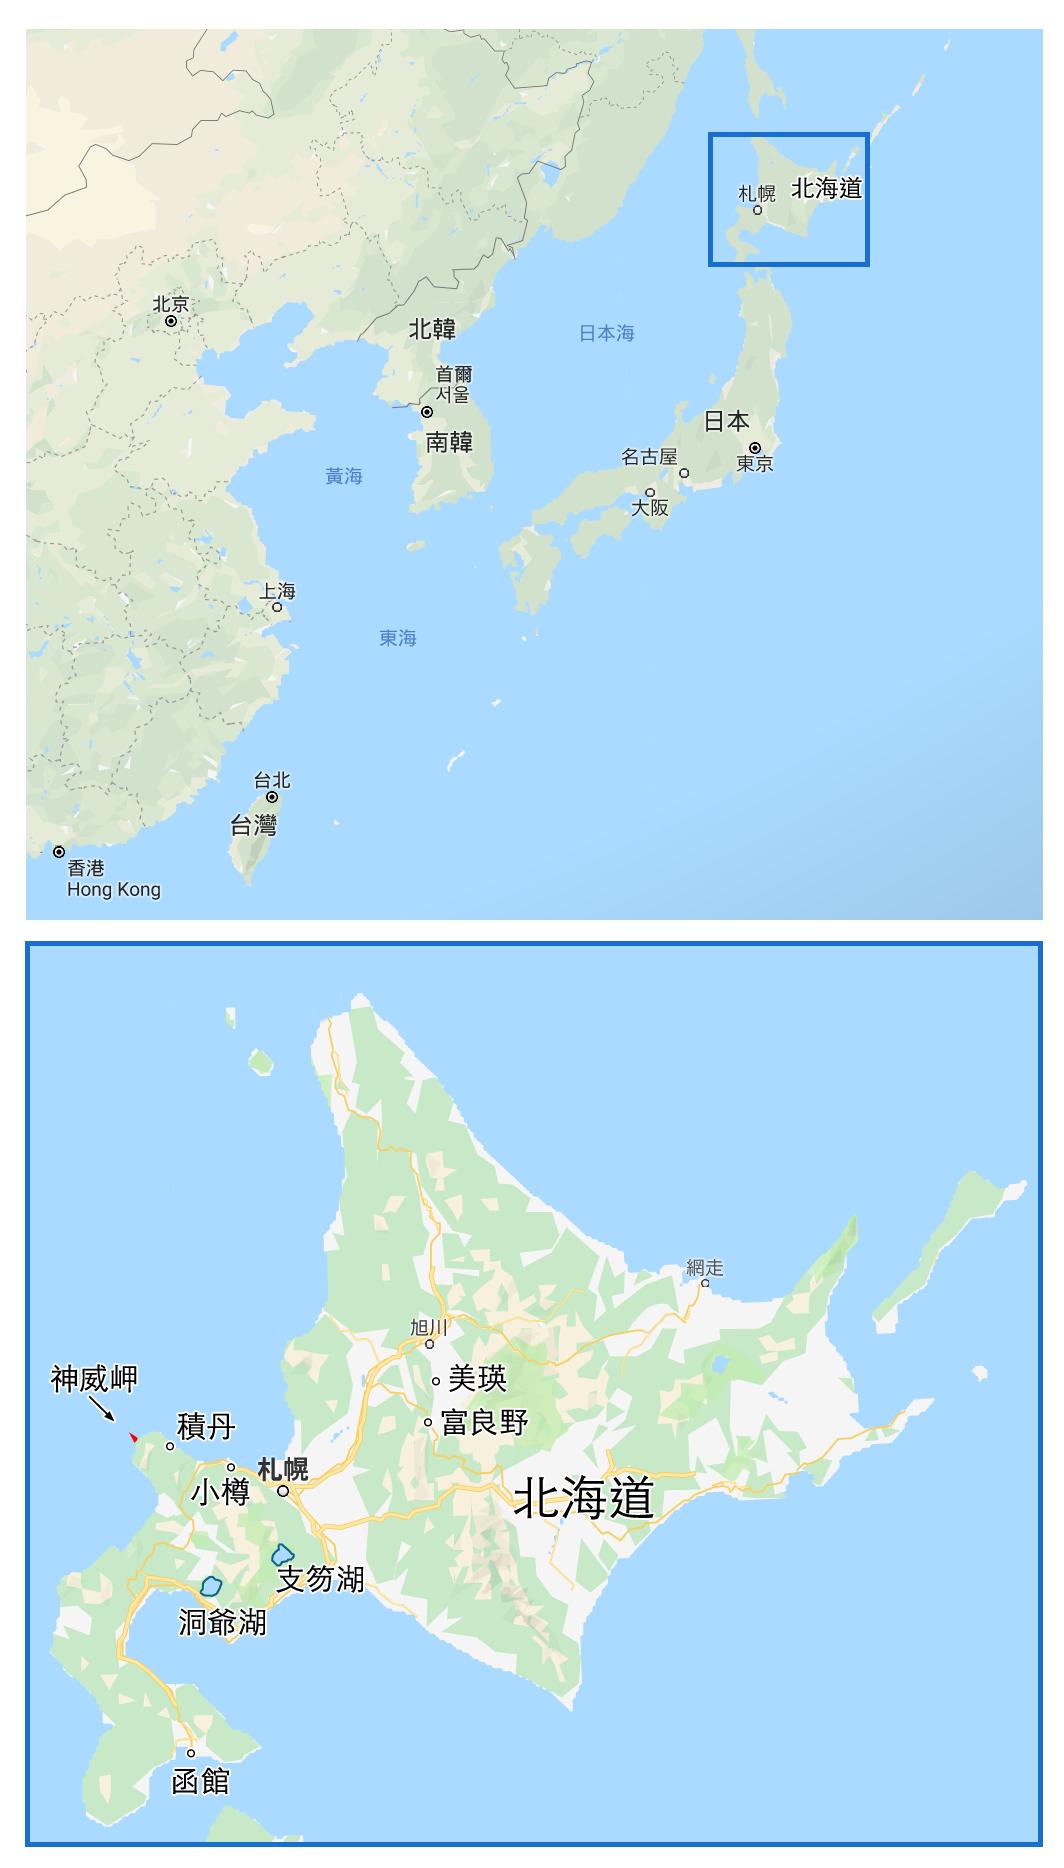 北海道-map.png